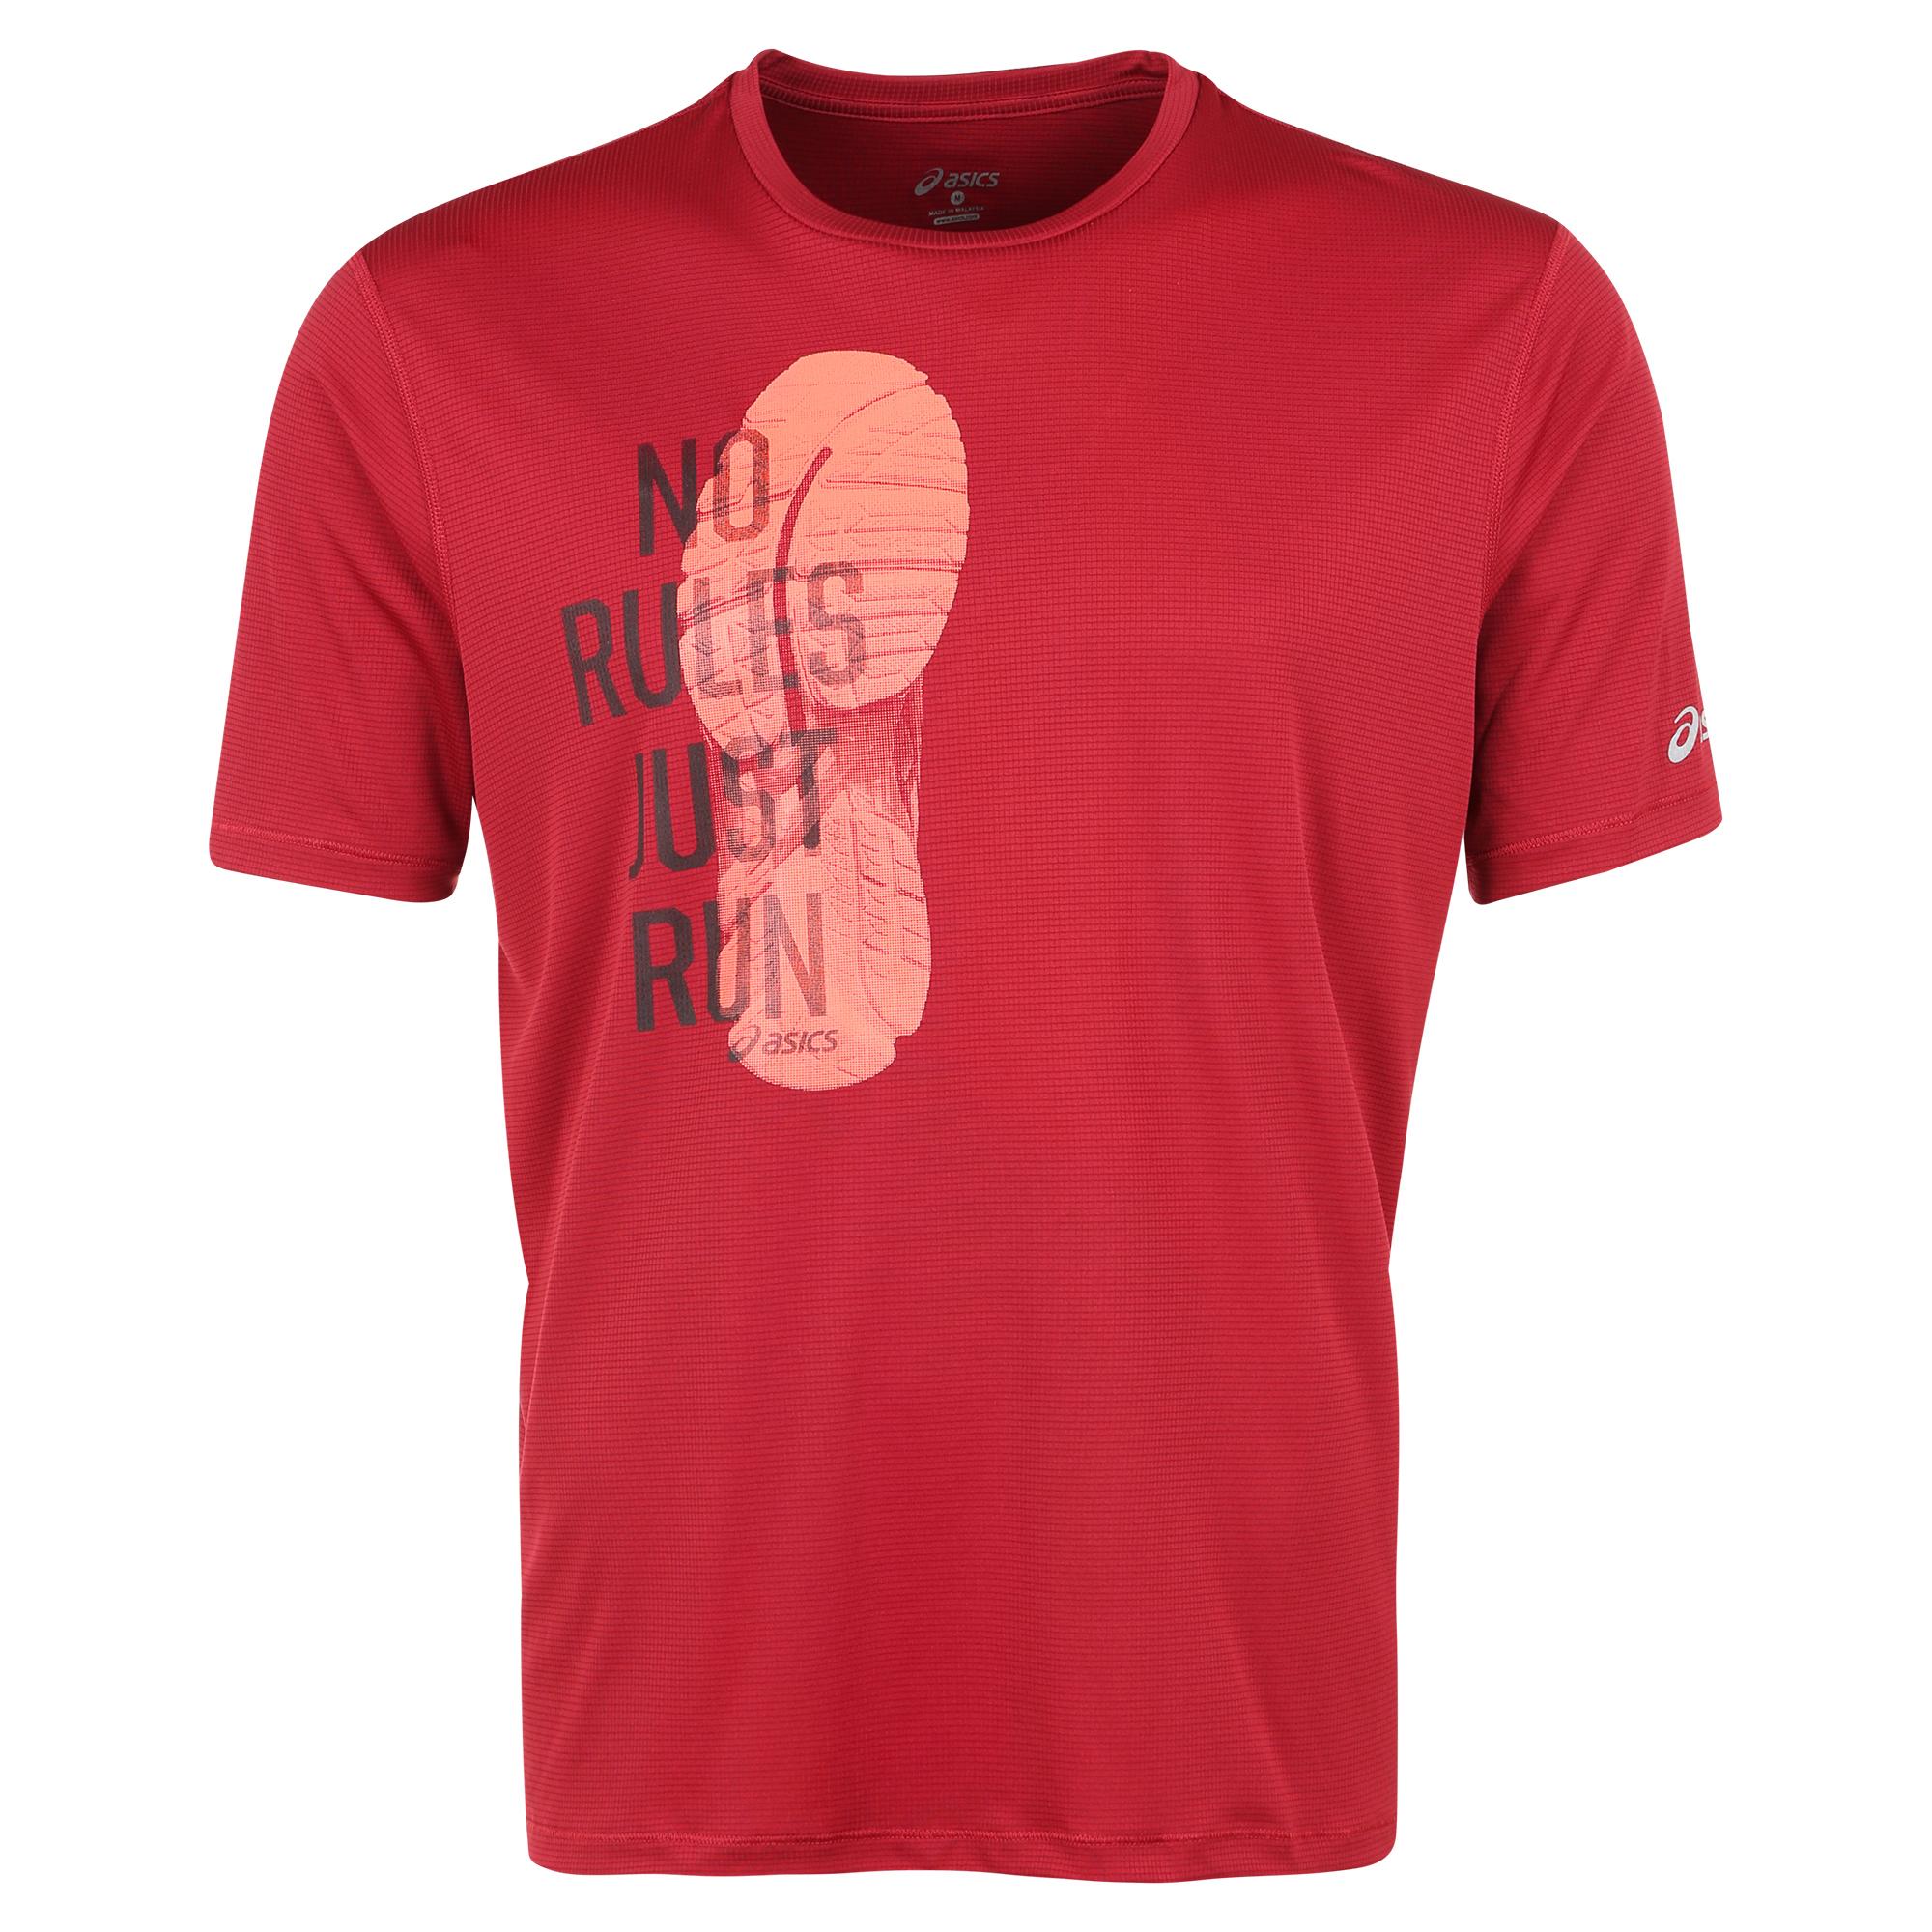 Мужская футболка Asics Graphic Top (121652 6010) wine